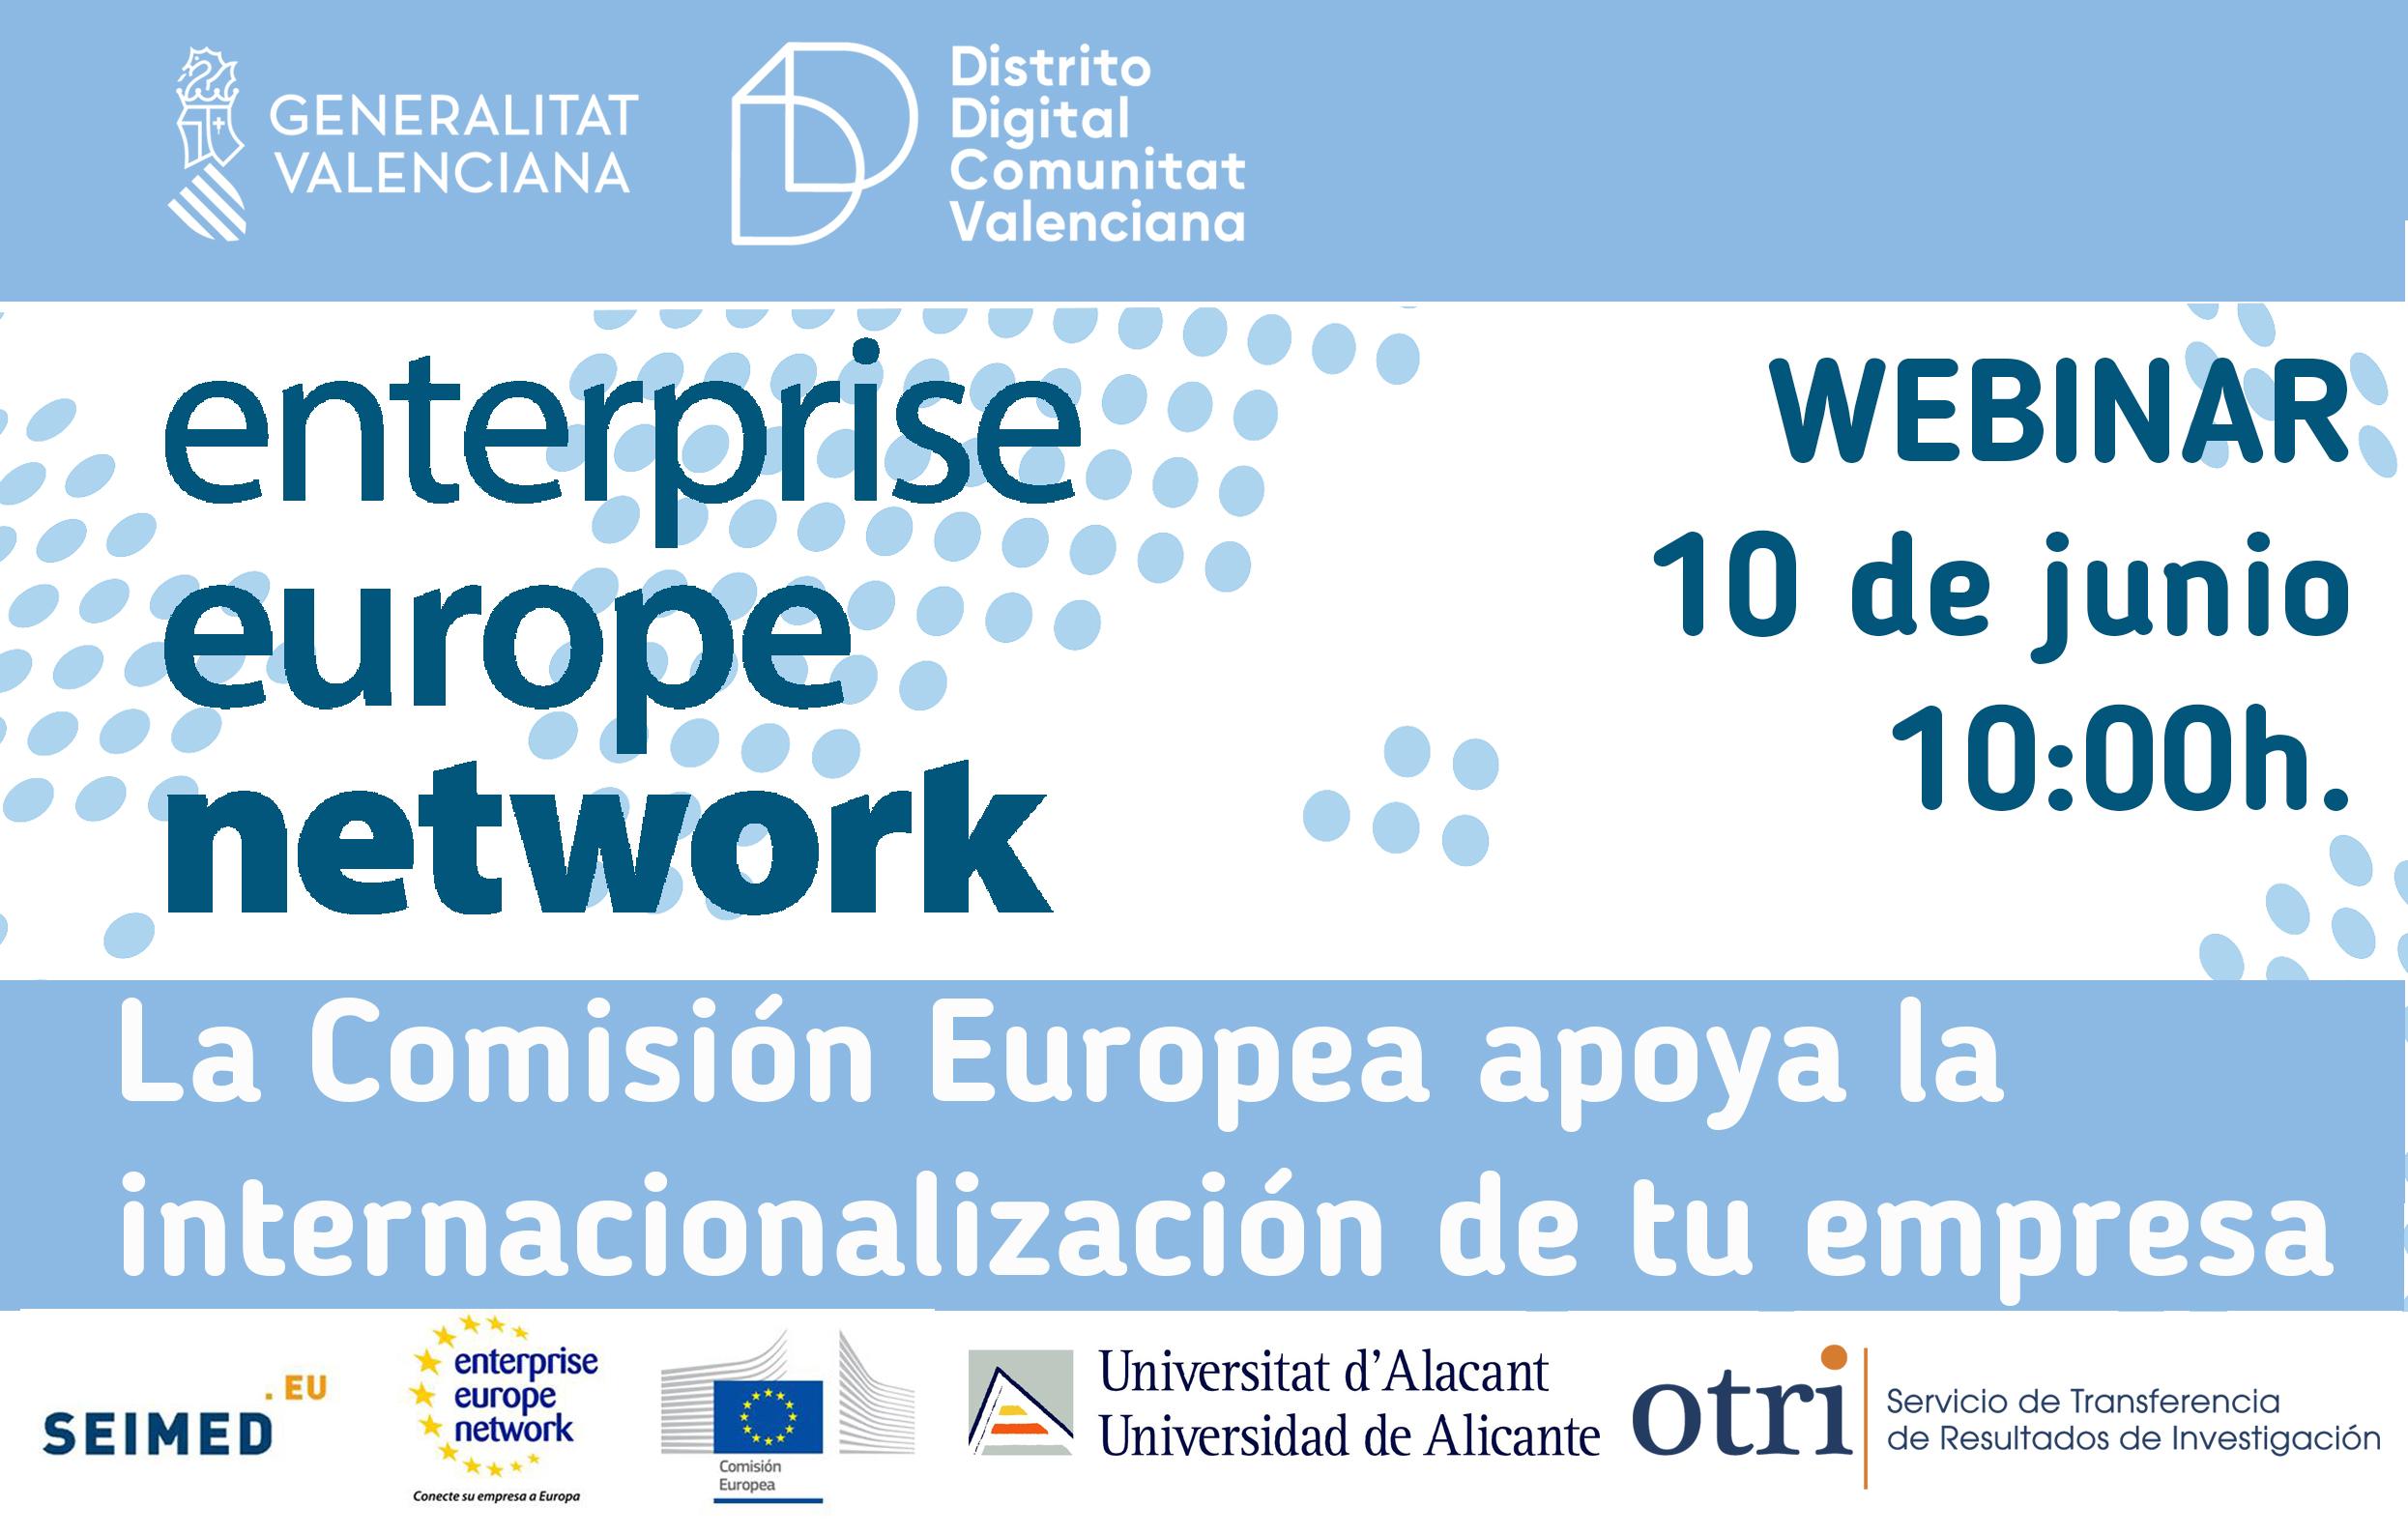 Distrito-Digital.Enterprise-Europe-Network